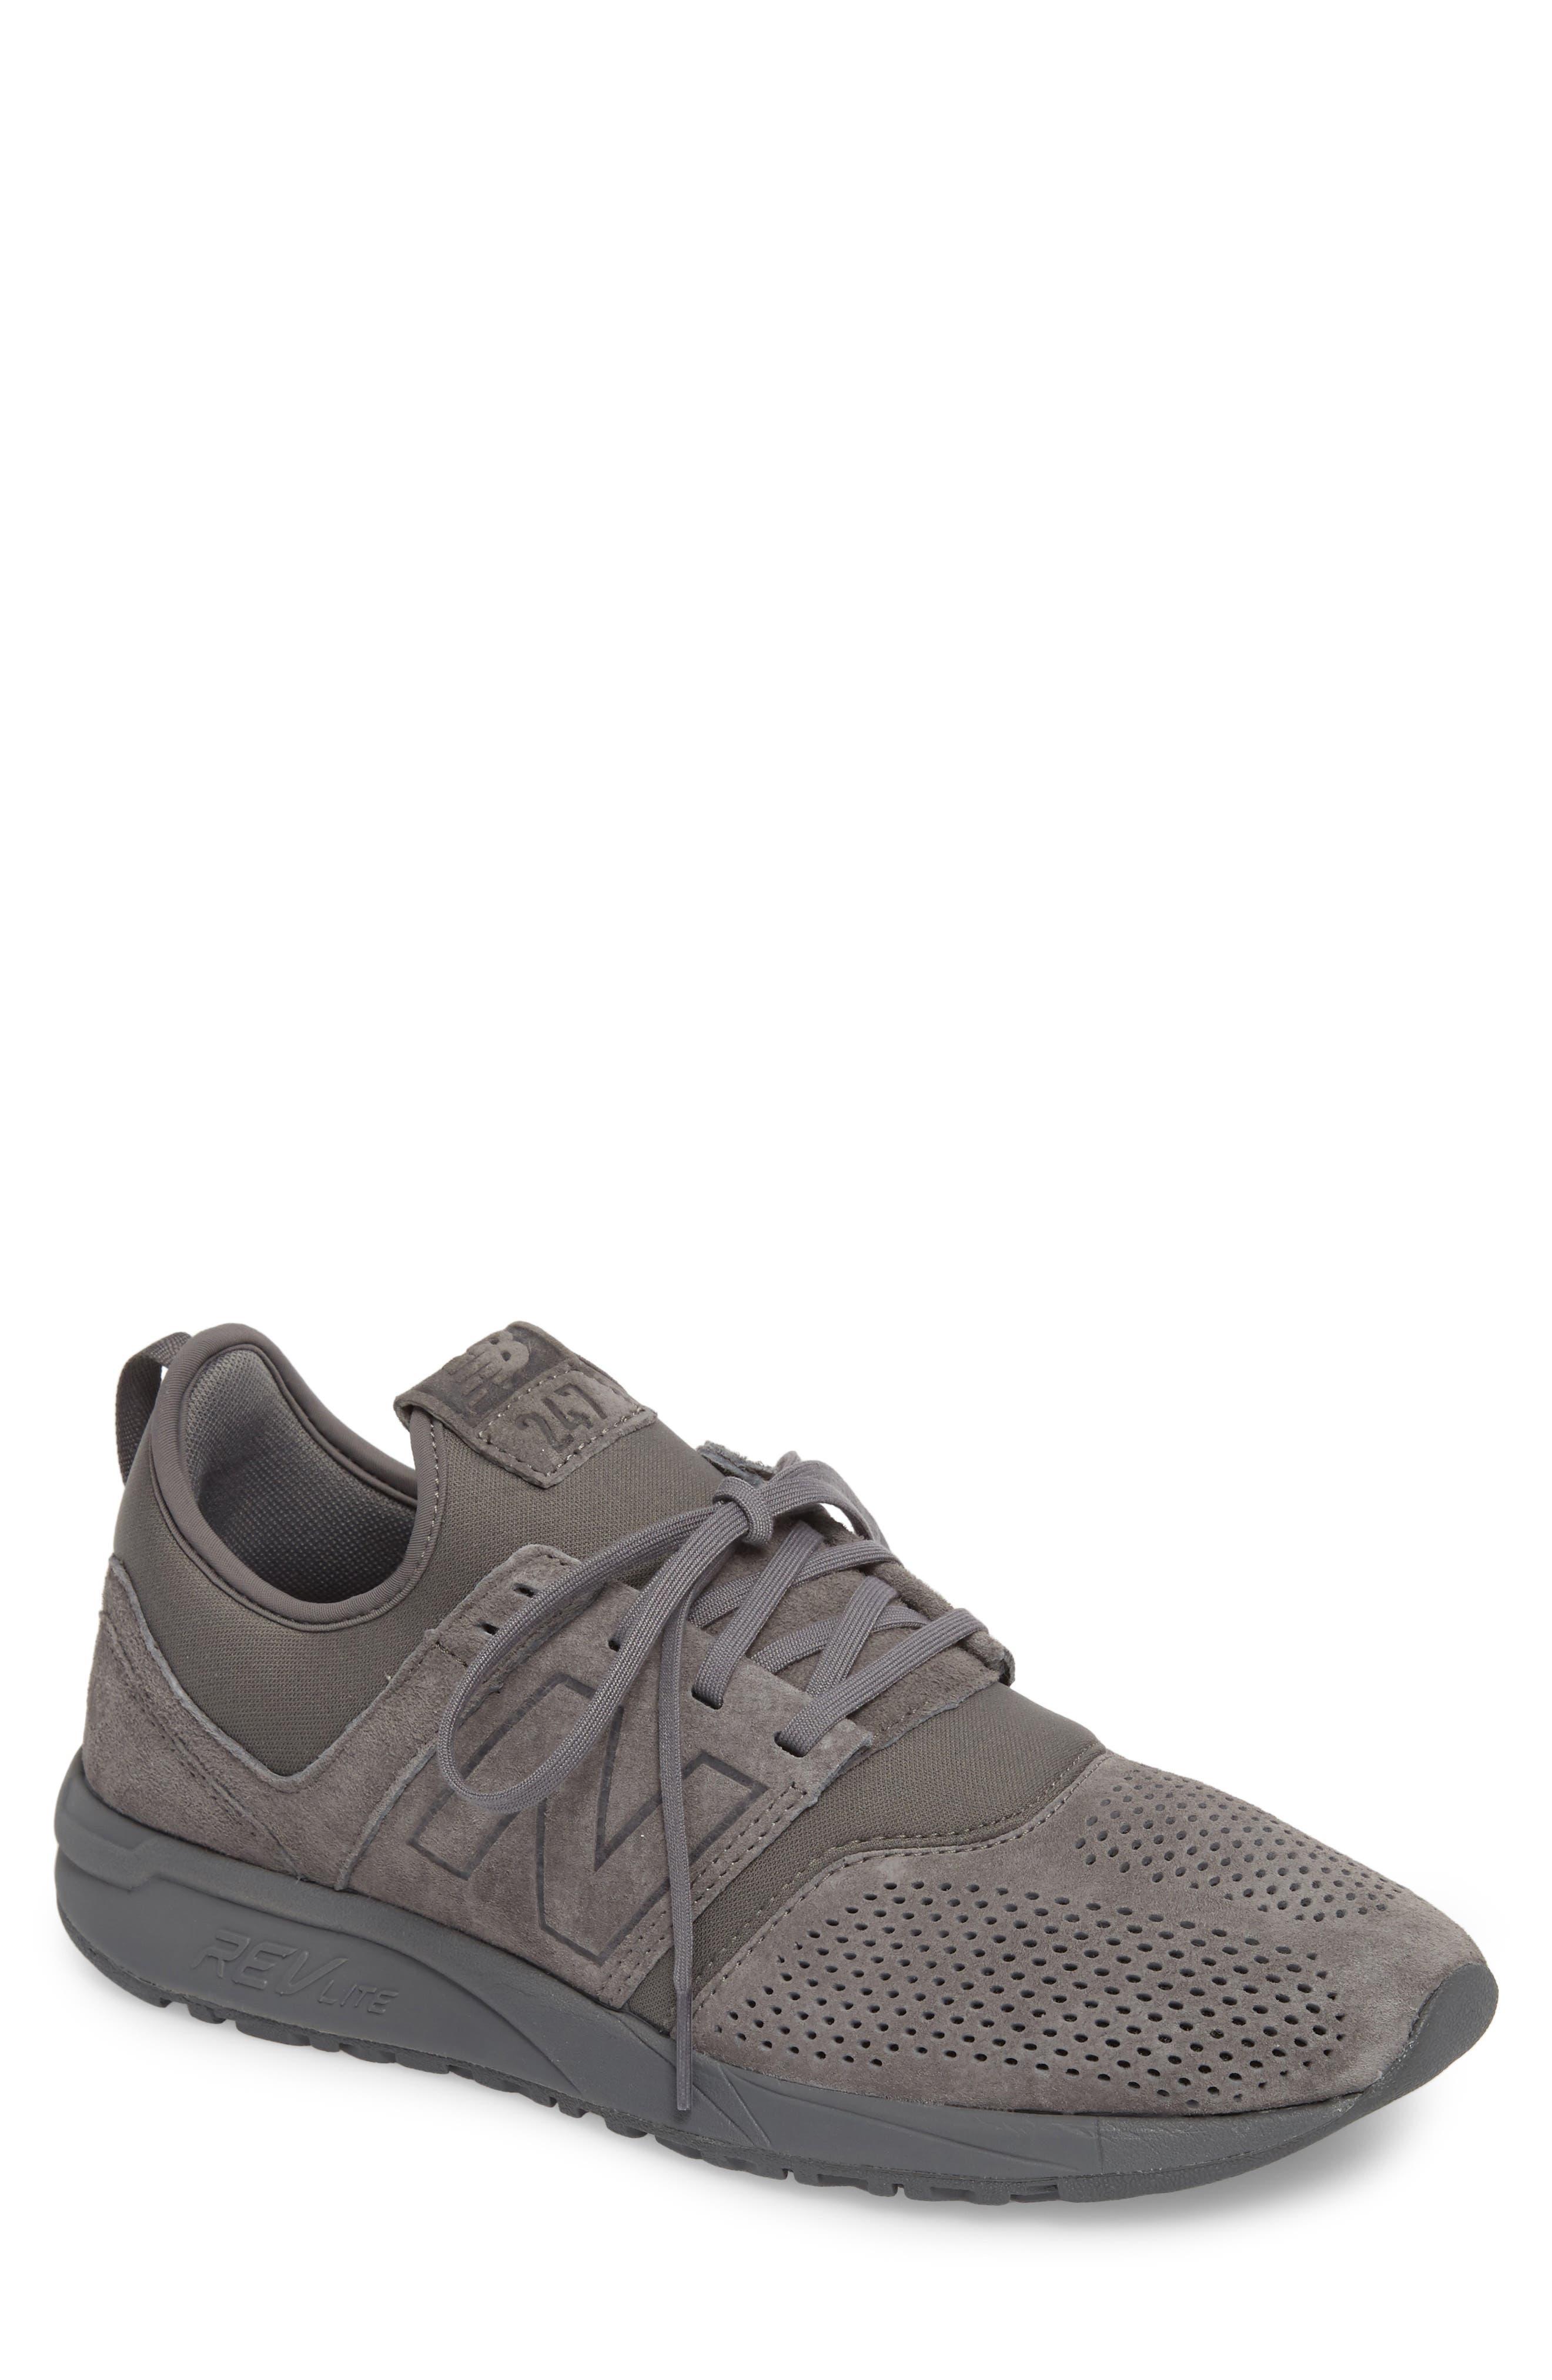 MRL247 Sneaker,                         Main,                         color, Grey